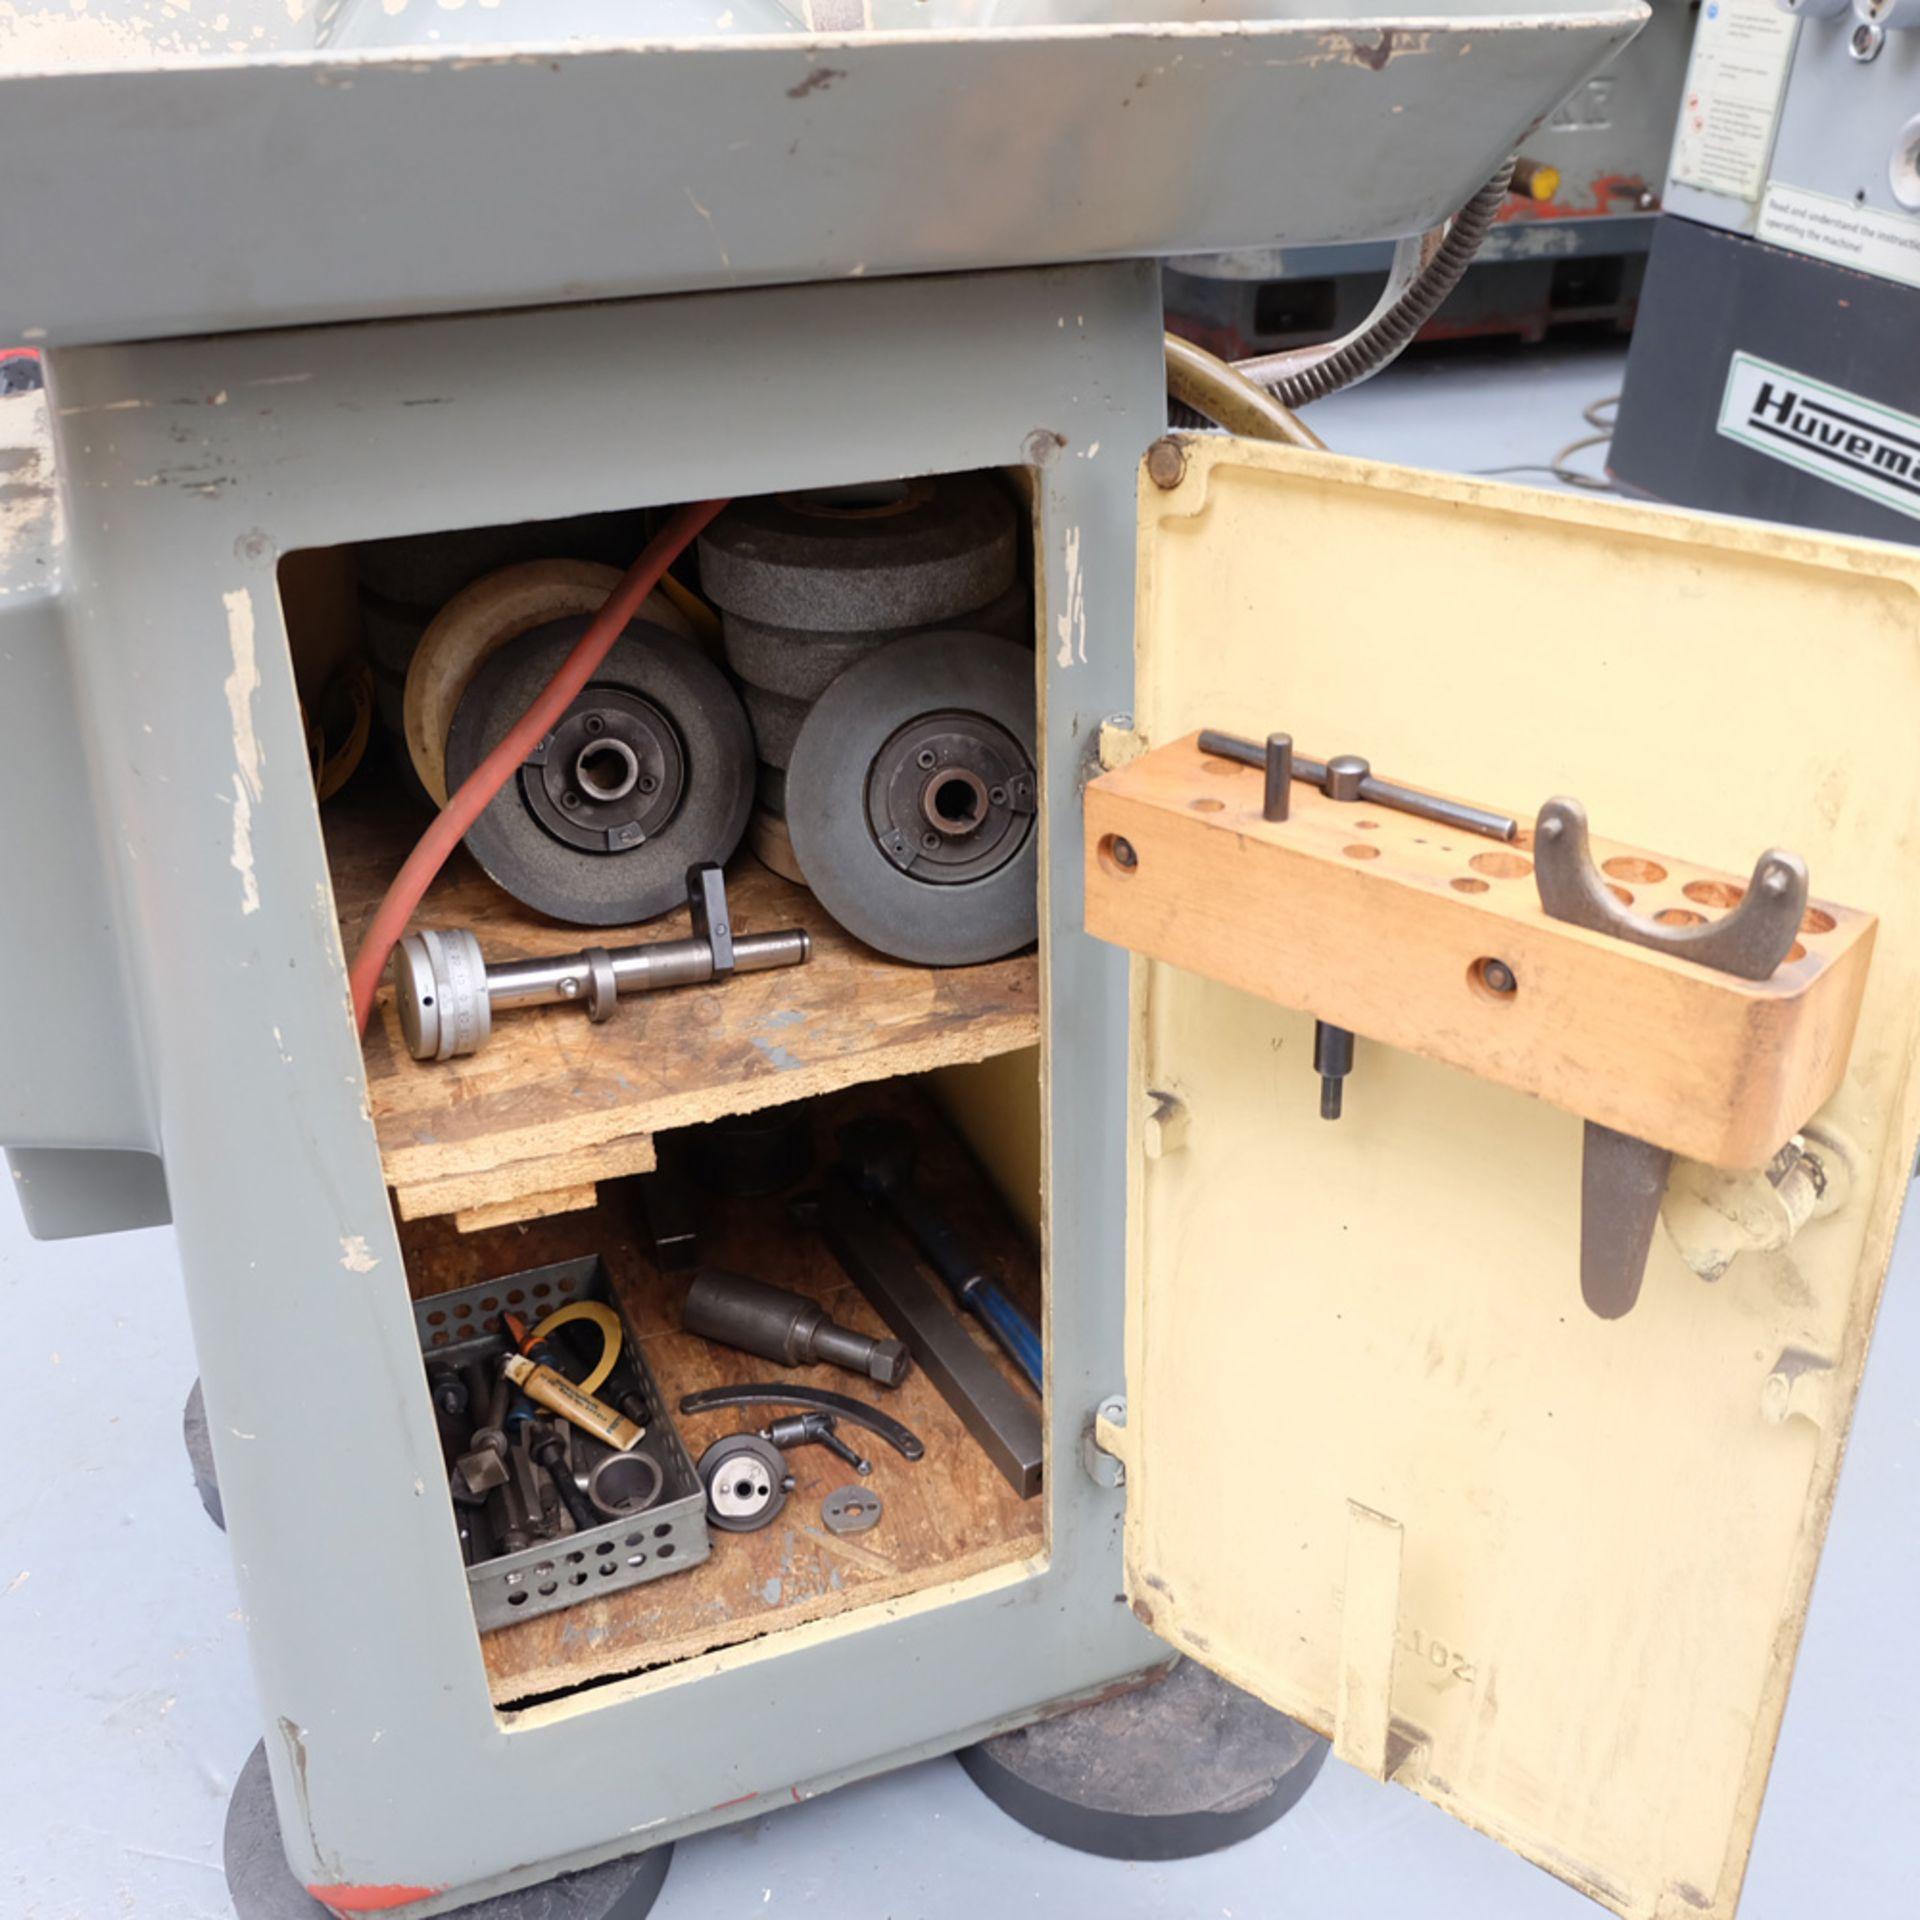 Christen Type 2-32 Twist Drill Grinding Machine. - Image 11 of 14